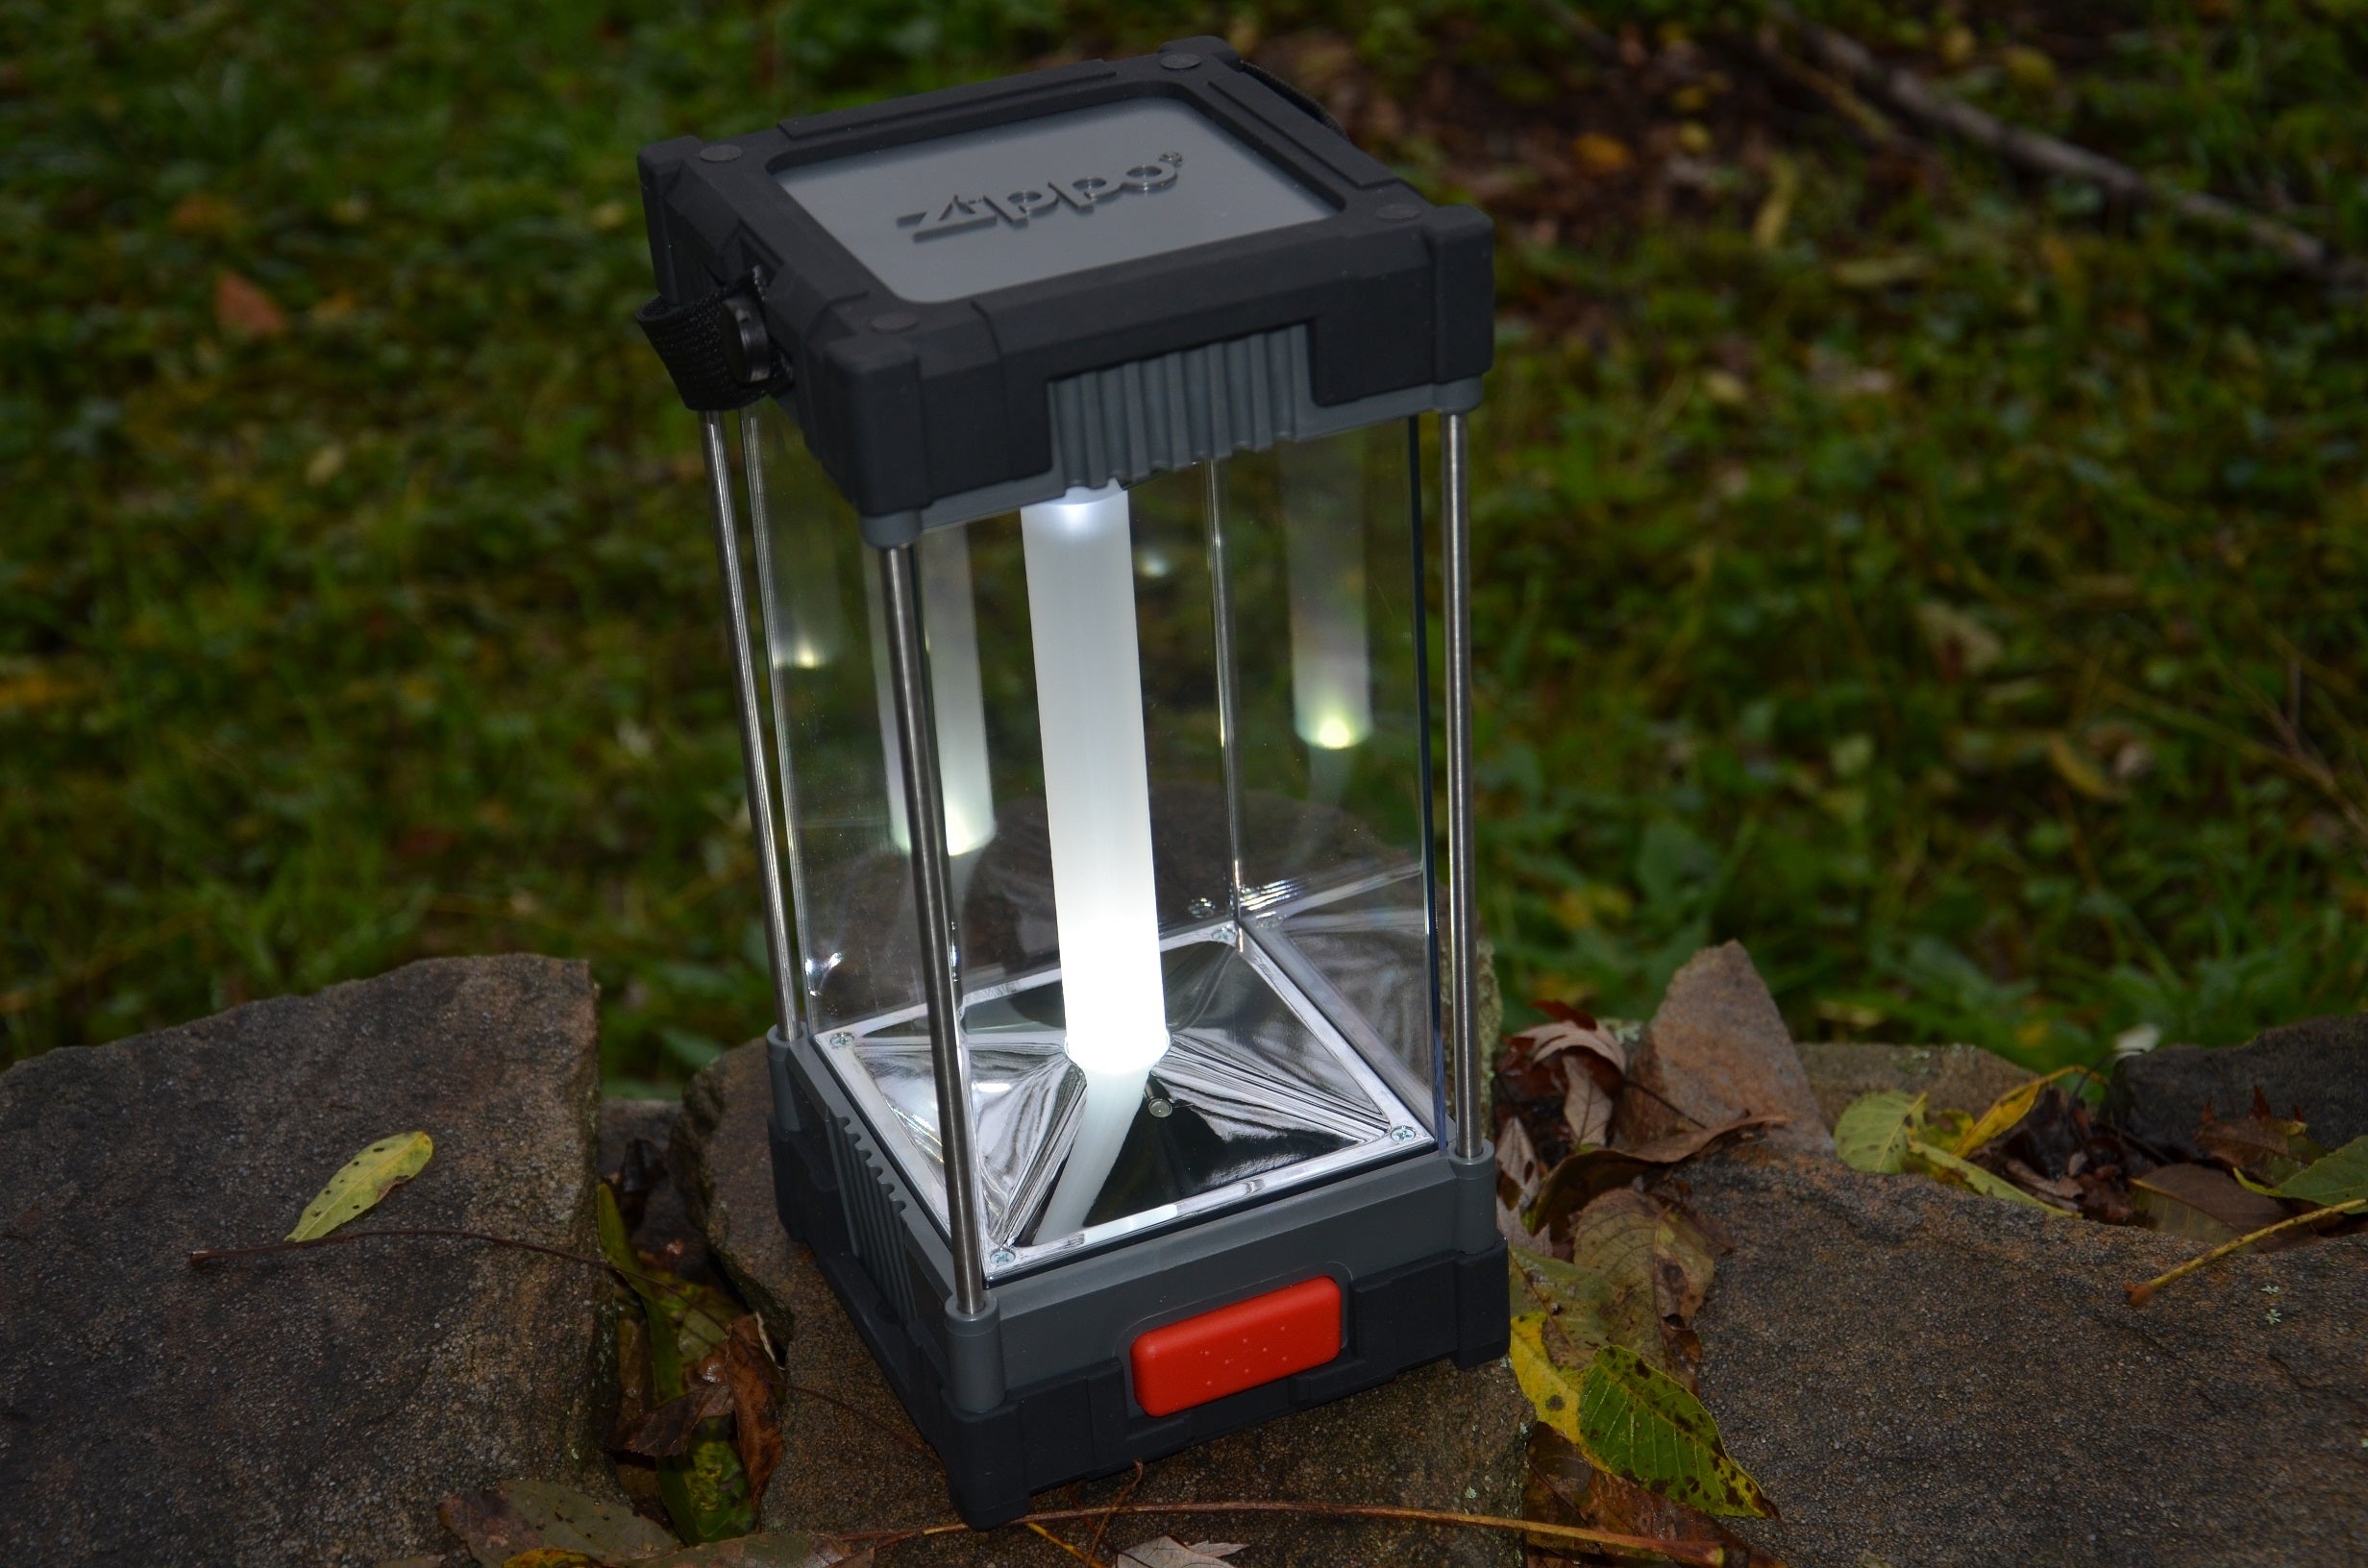 Survival Gear Review: Zippo Rugged Lantern